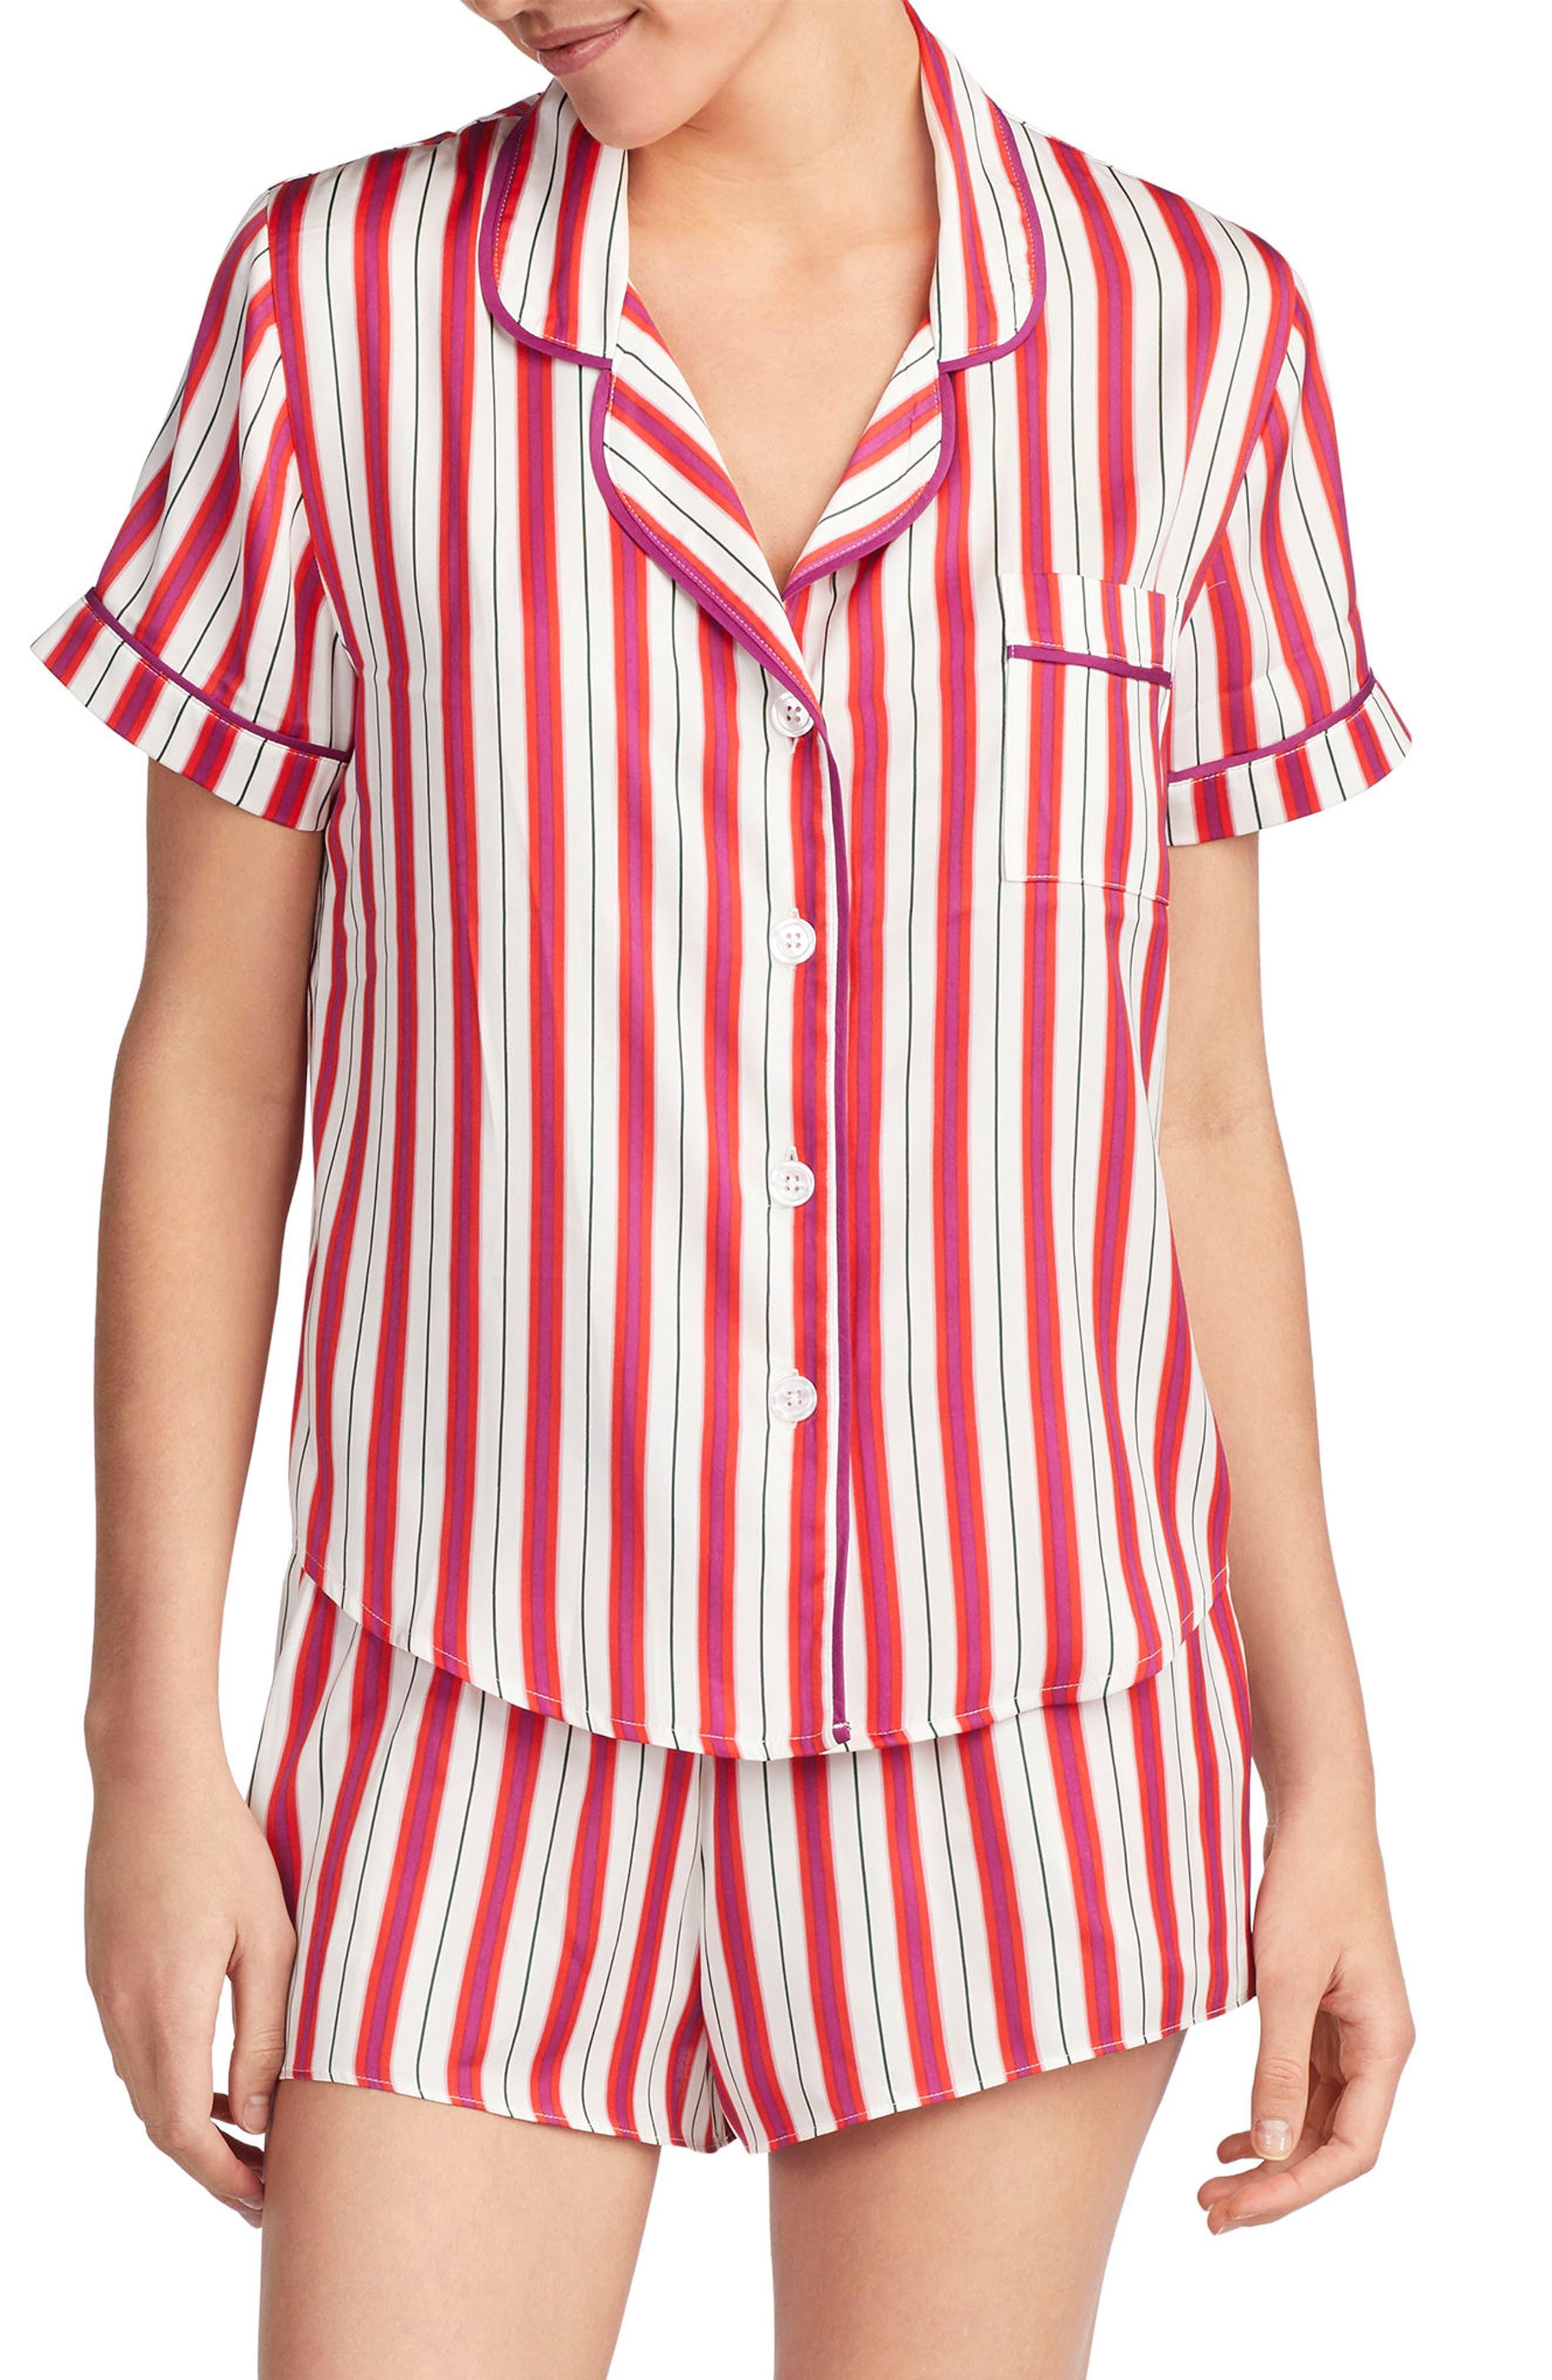 Room Service Satin Pajama Top (Nordstrom Exclusive)